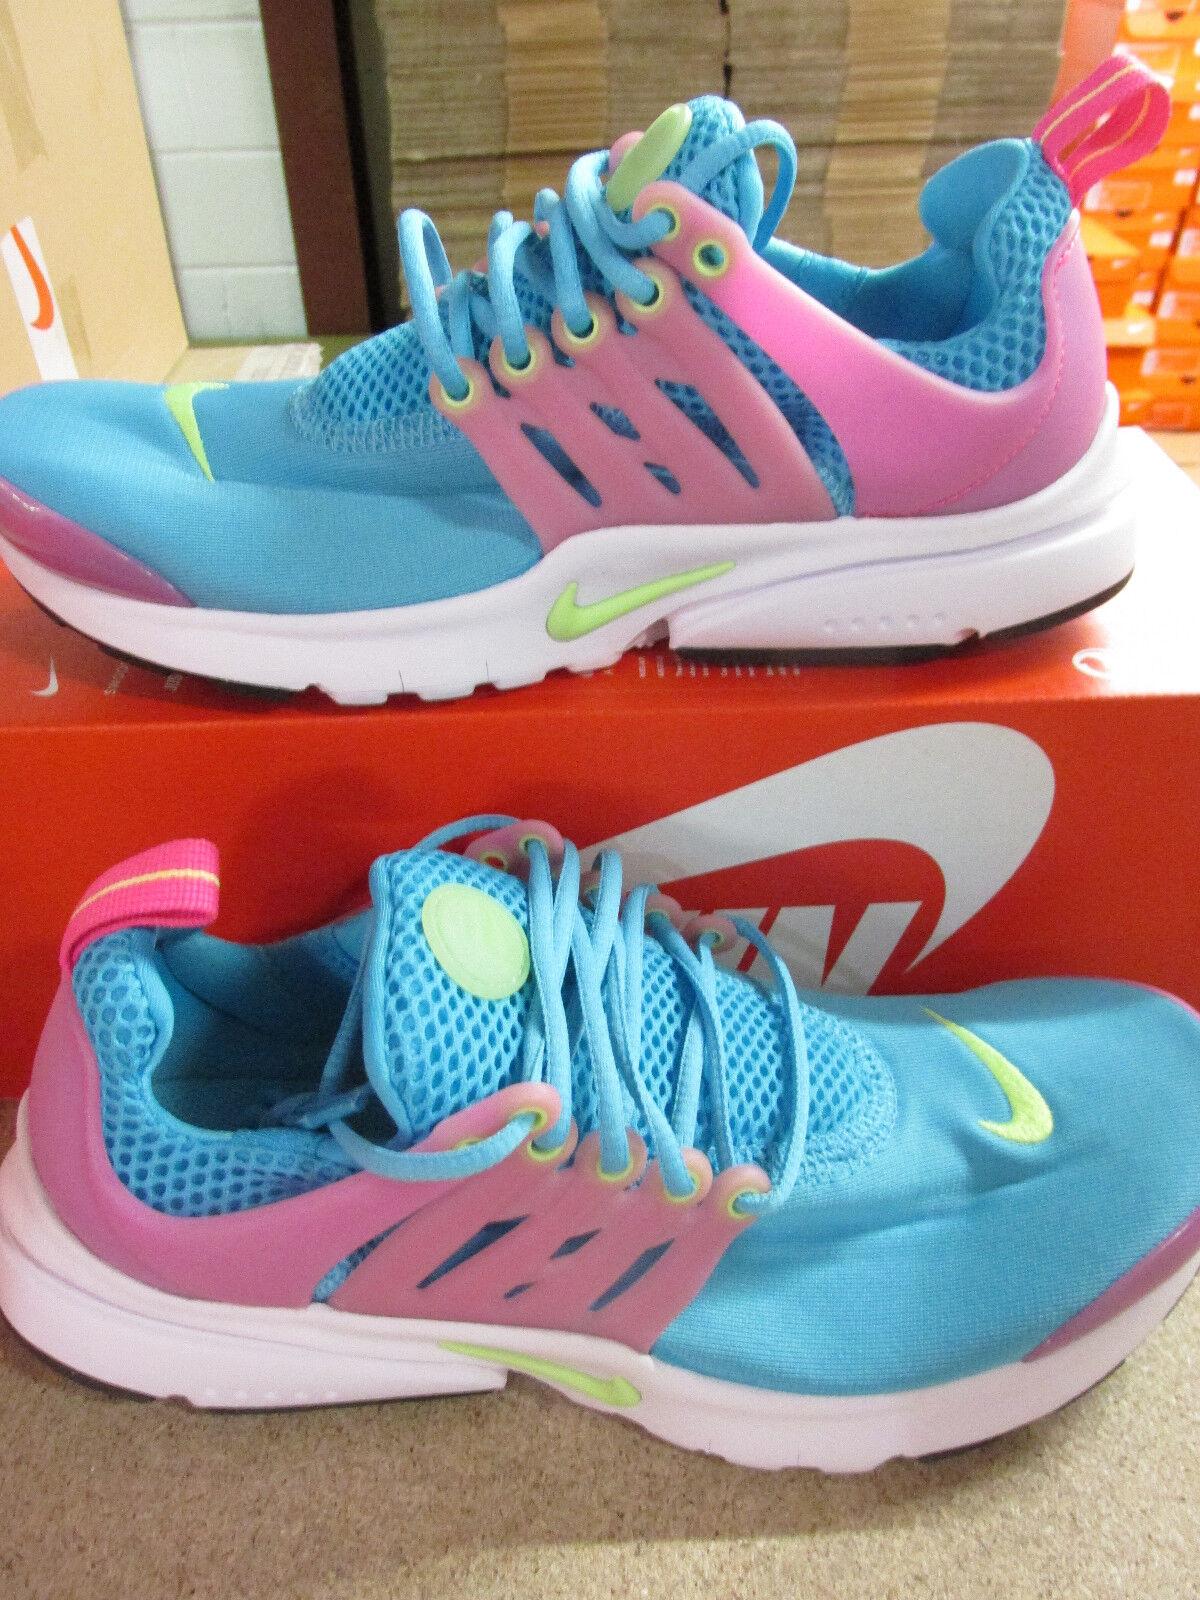 Nike presto (GS) youth running trainers 833878 400 scarpe da ginnastica Scarpe CLEARANCE